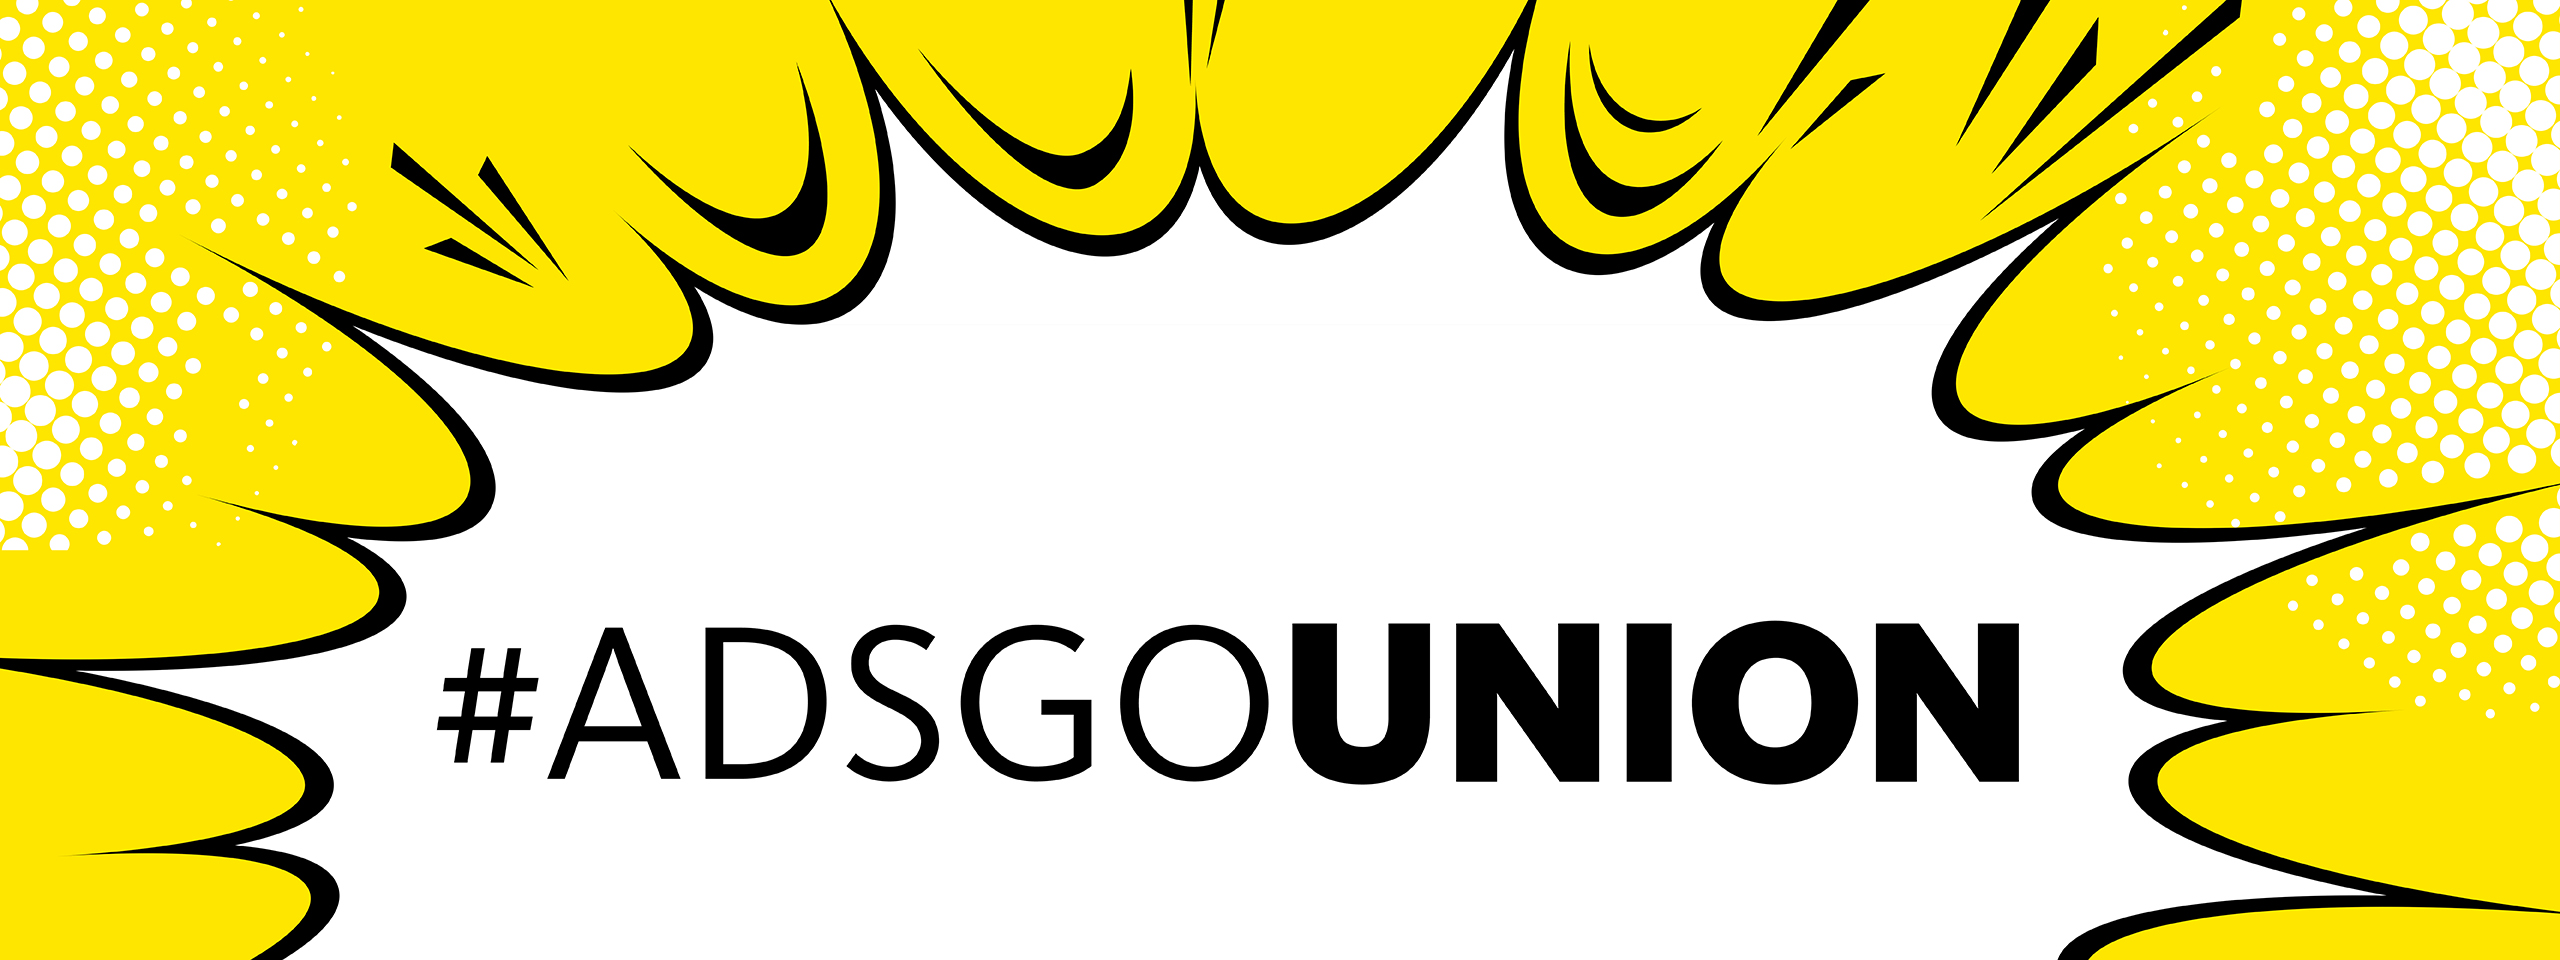 Hashtag Ads Go Union